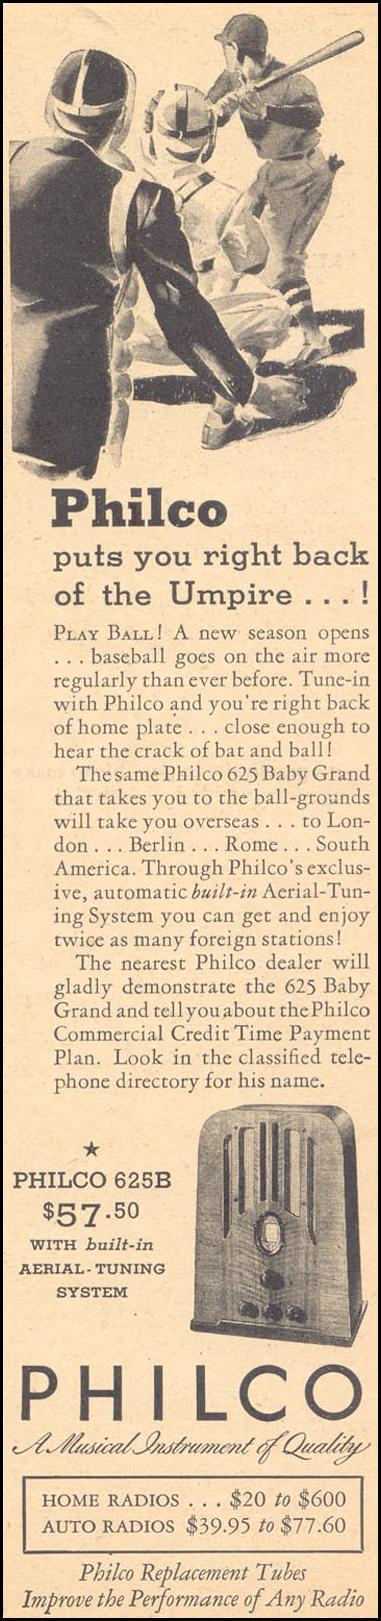 PHILCO RADIOS LIBERTY 04/11/1936 p. 47